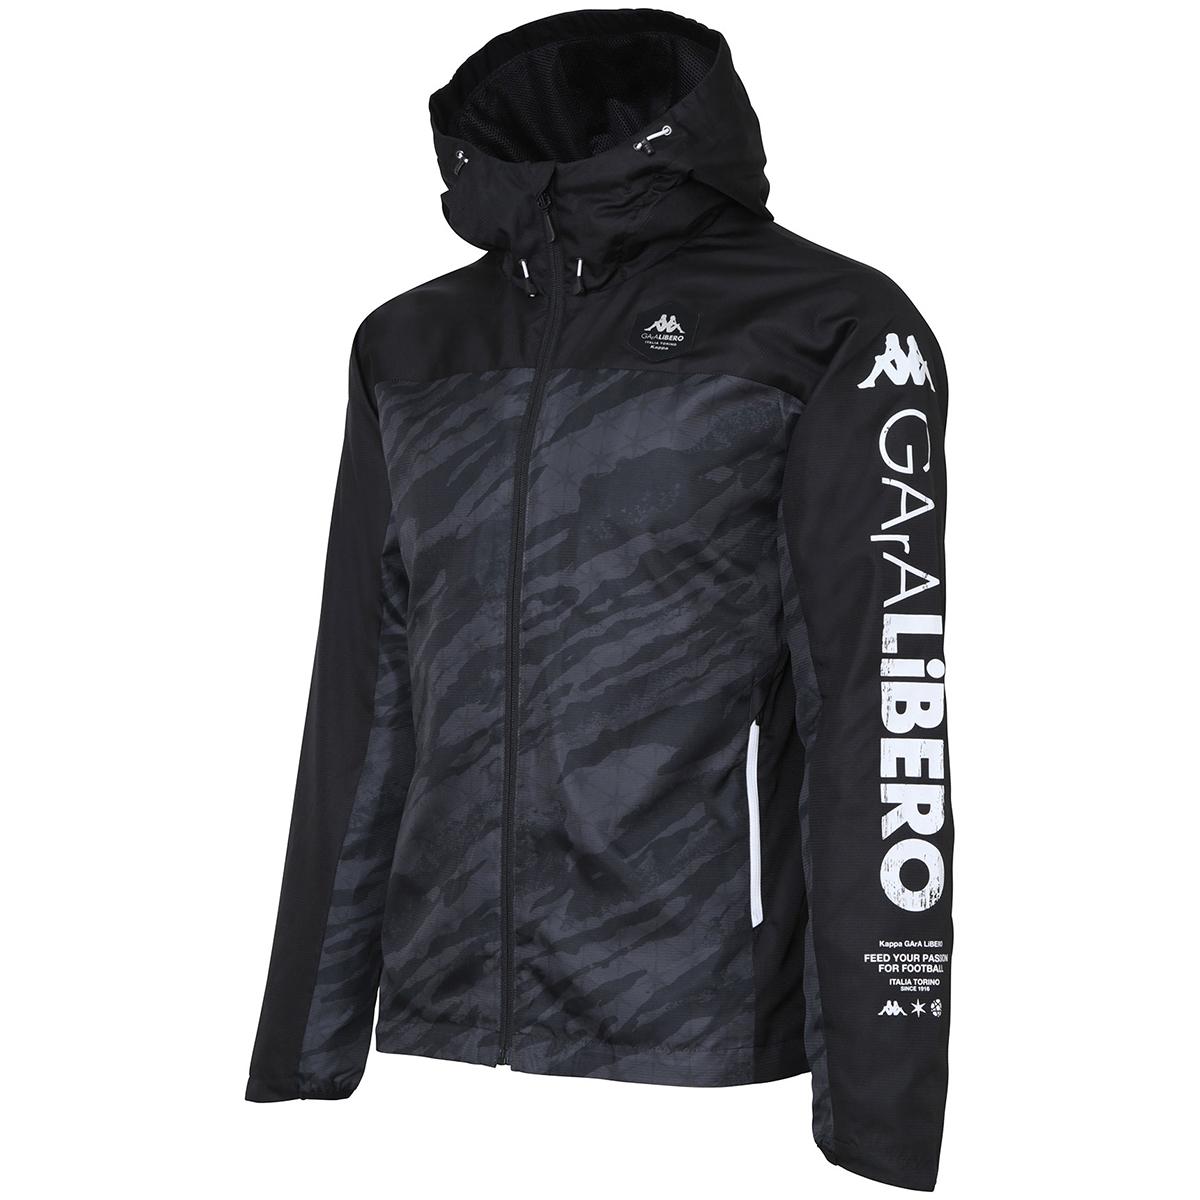 GArA LiBERO ストレッチウィンドジャケット